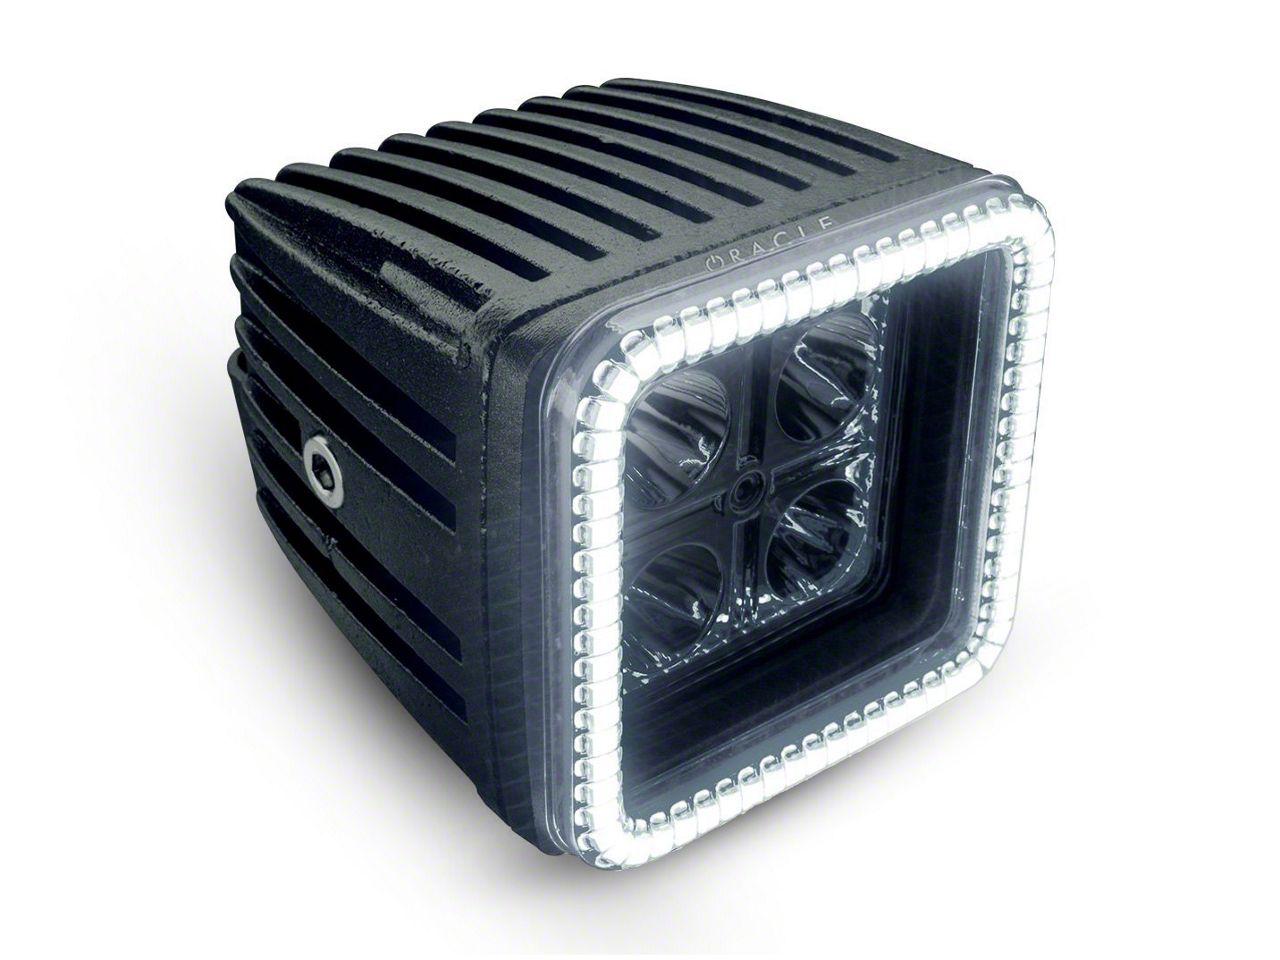 Oracle 3 in. Square Halo for Cube/Square Lights - White (87-18 Jeep Wrangler YJ, TJ, JK & JL)